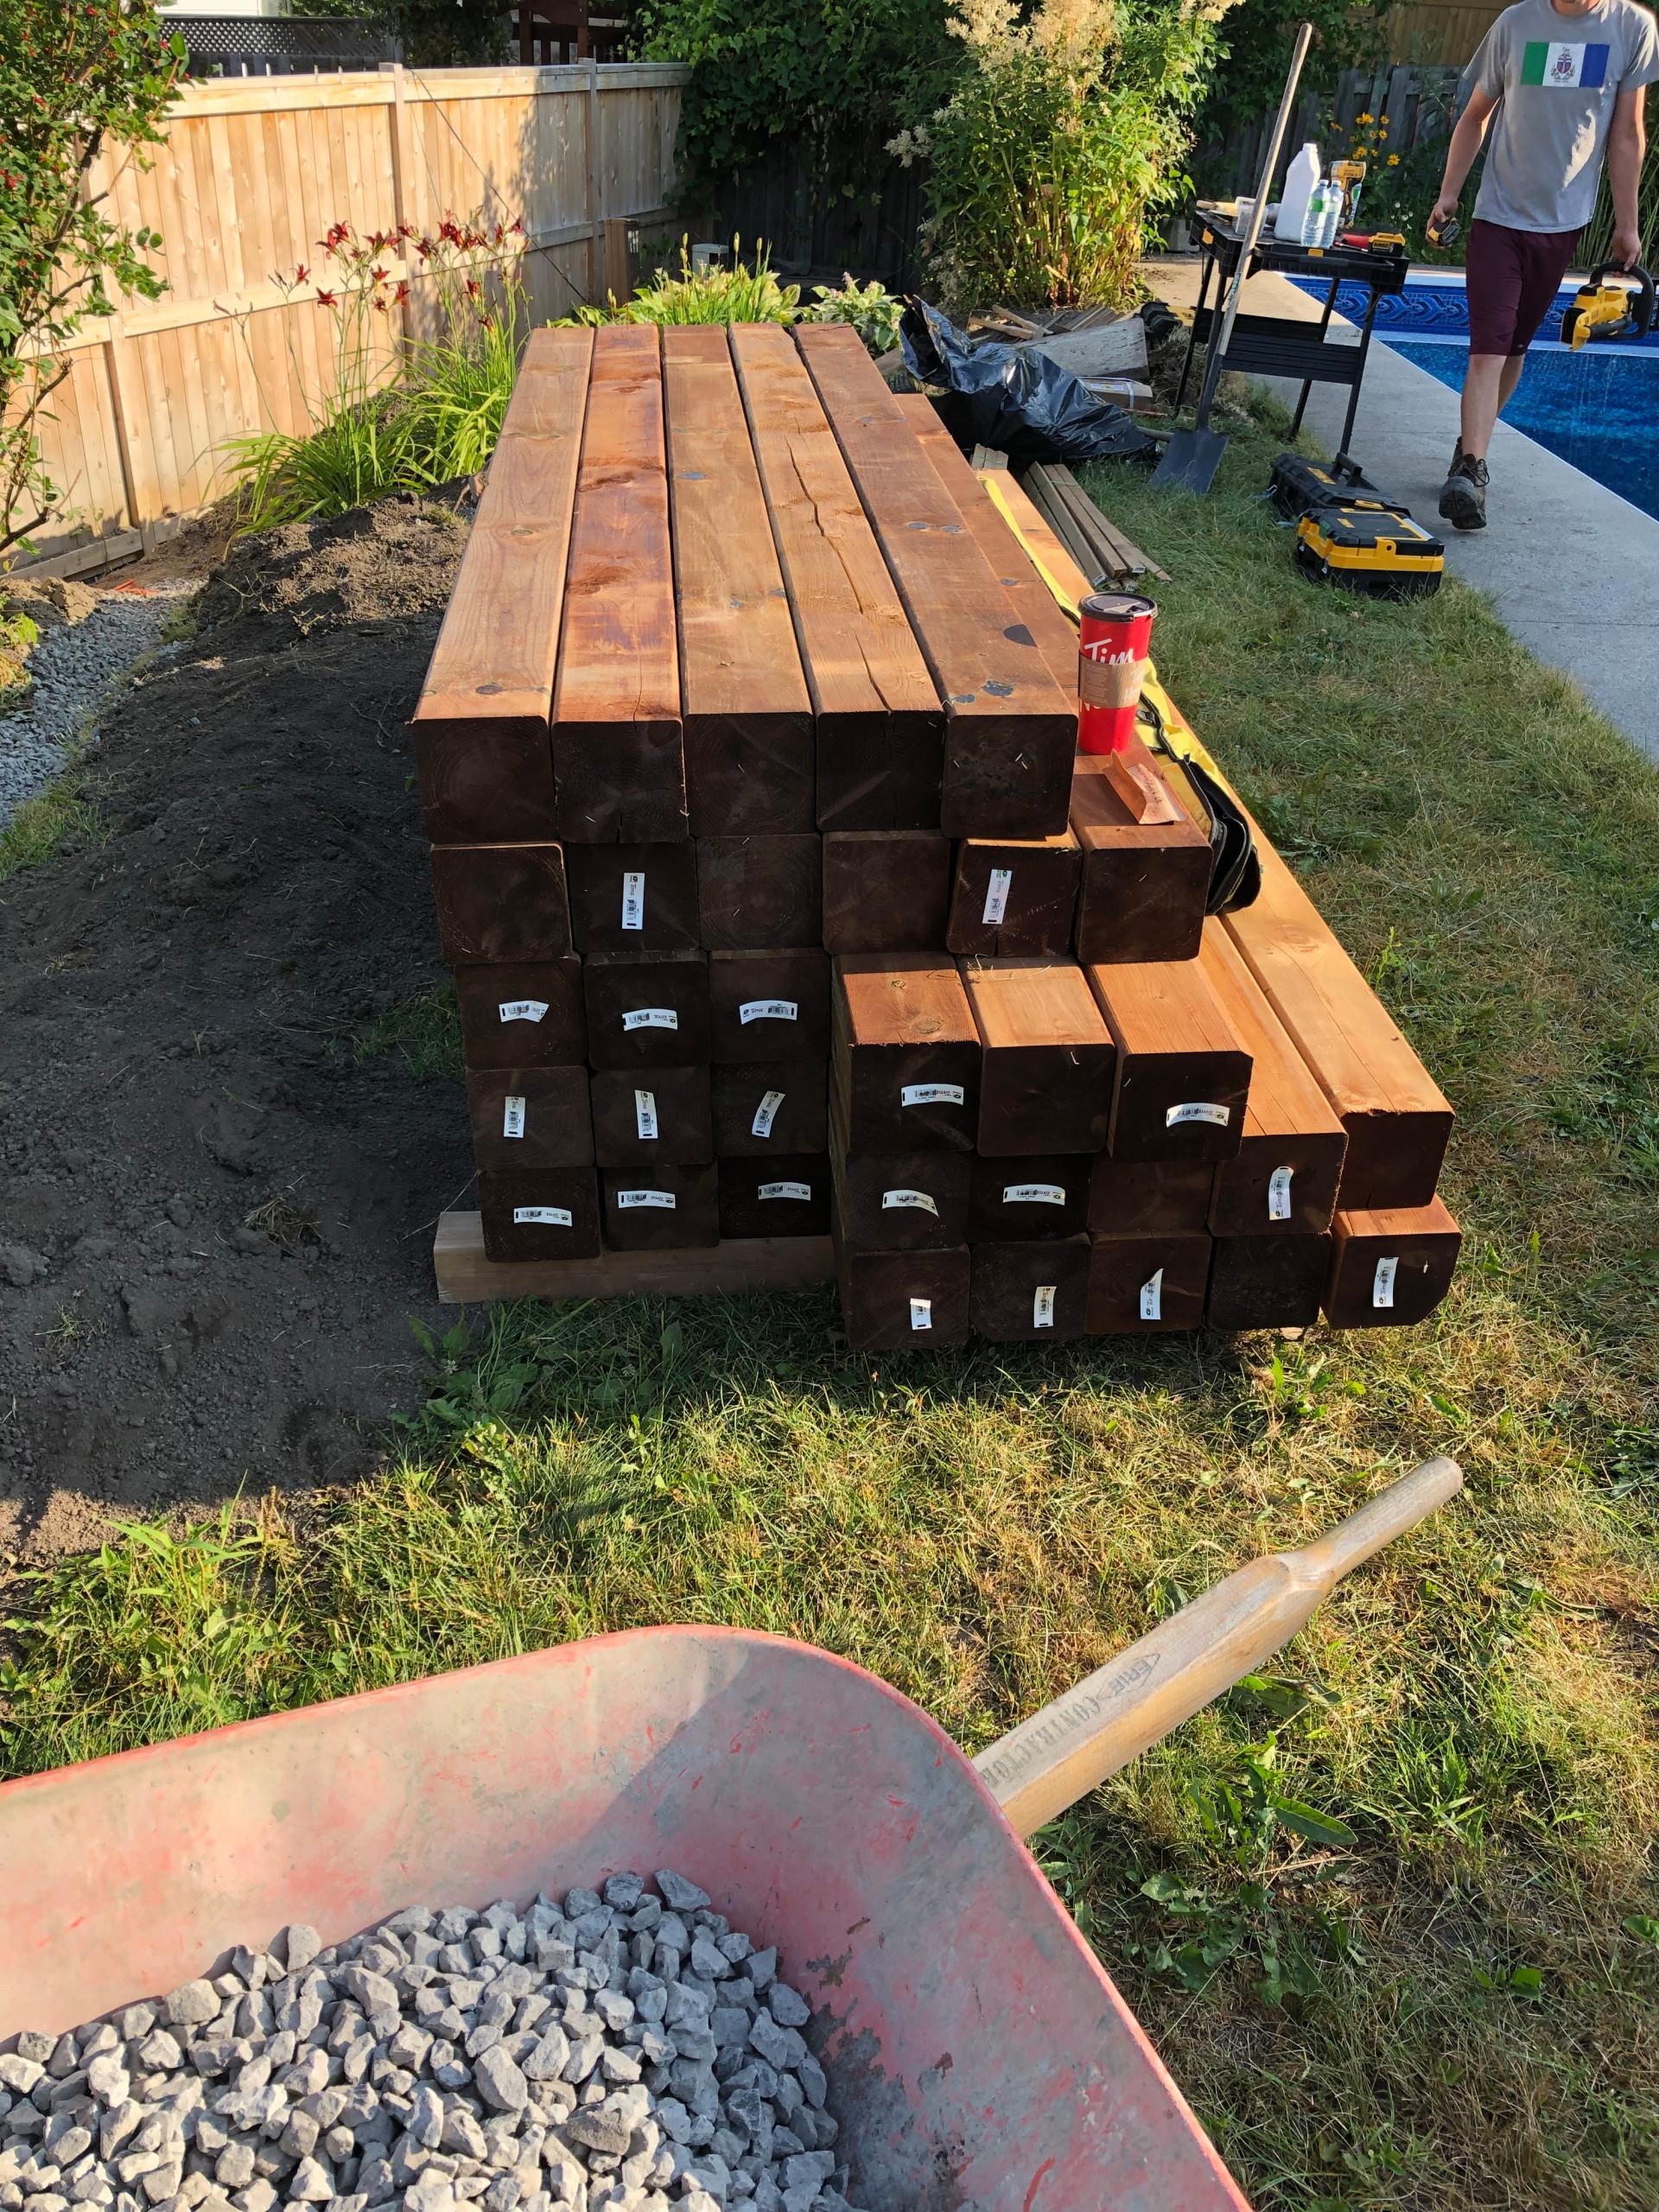 6 x 6 retaining wall